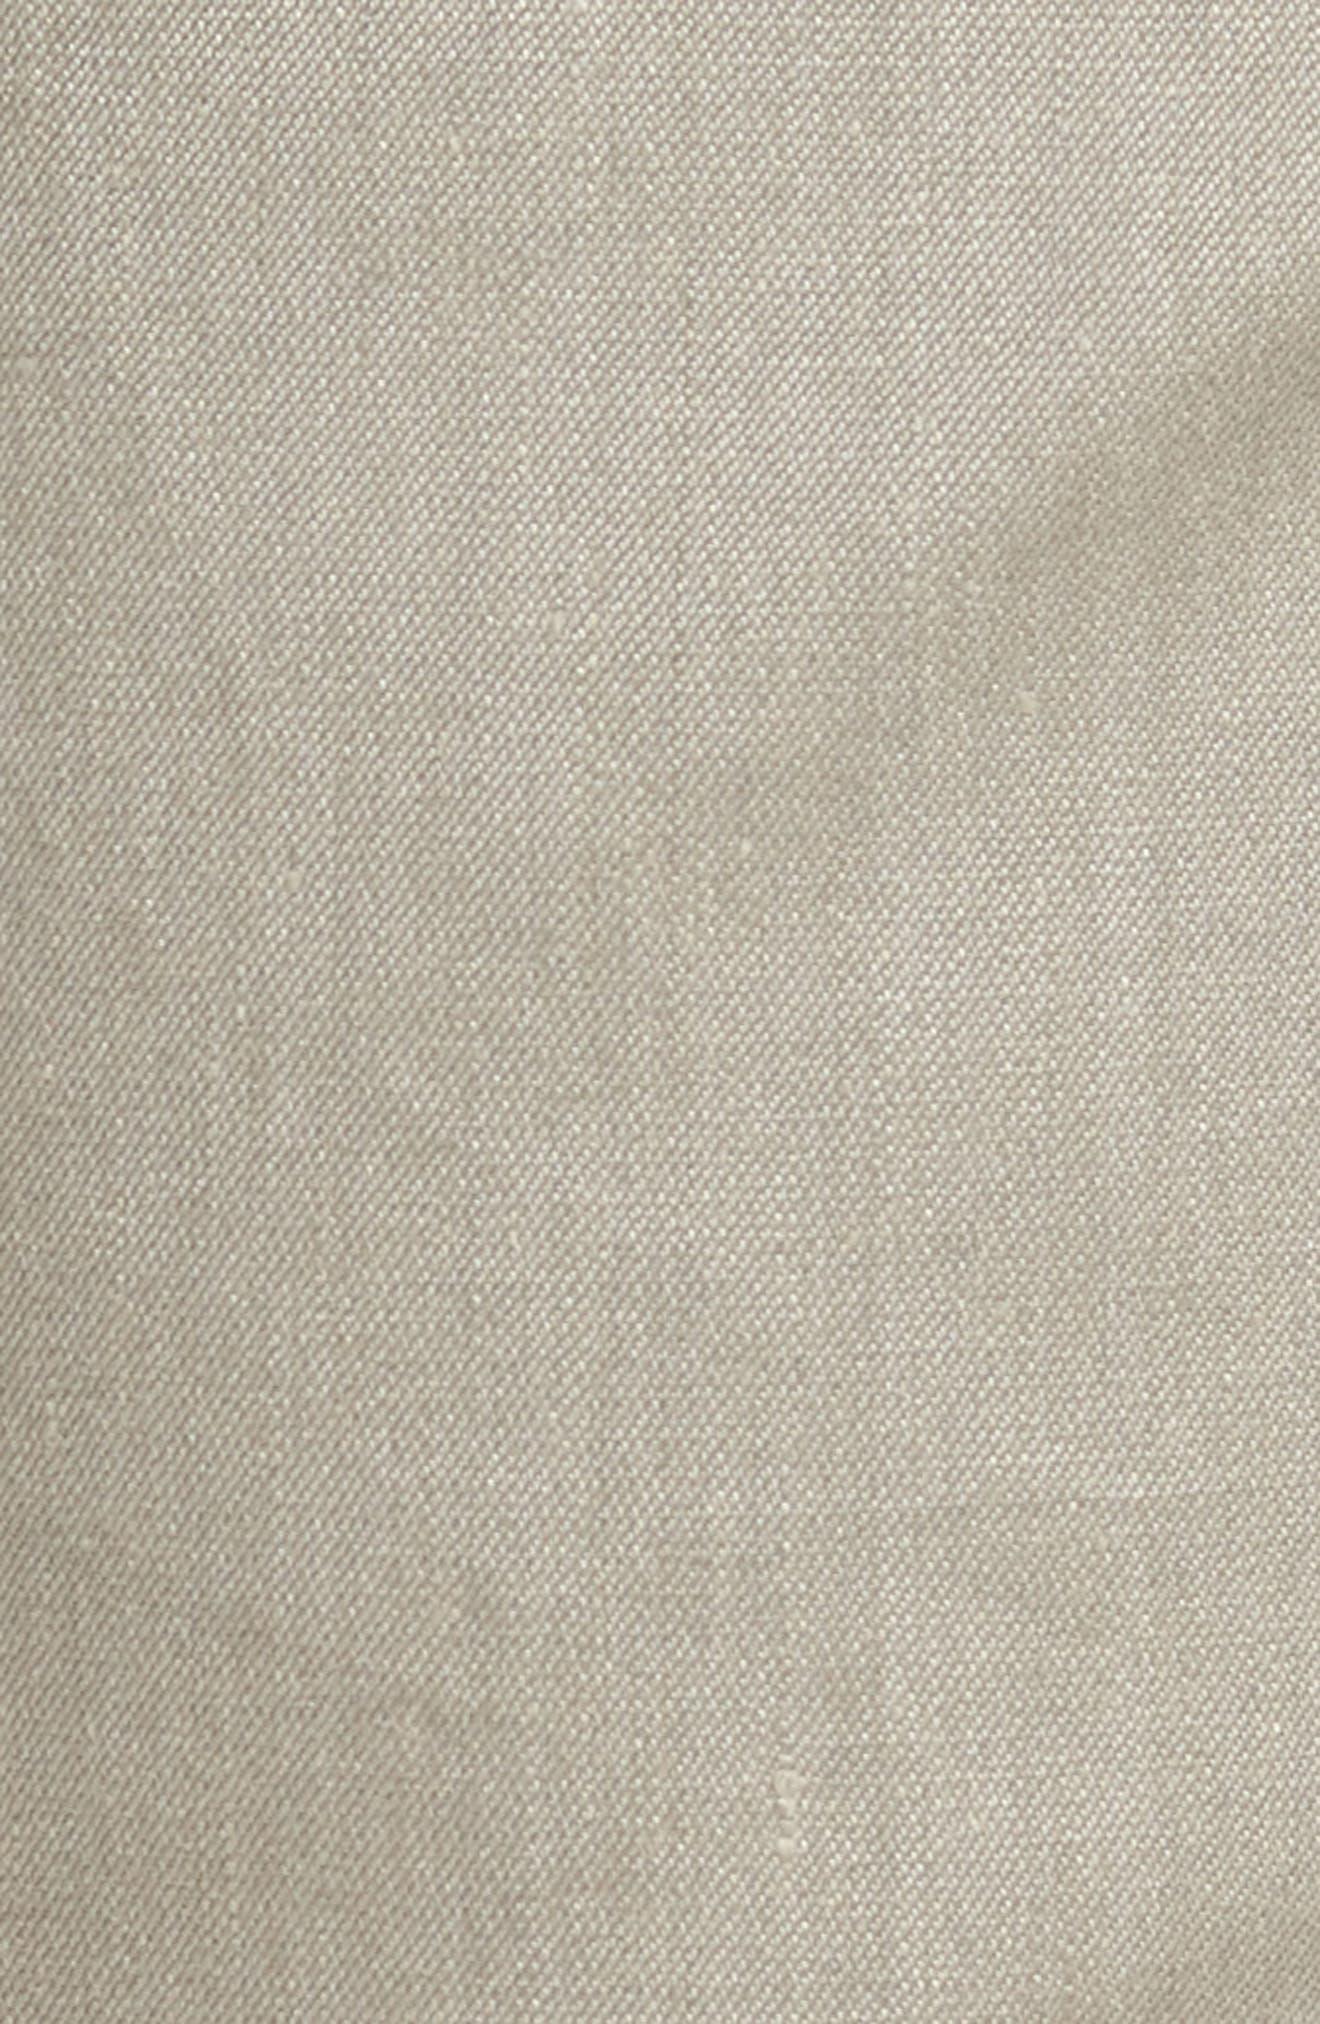 Flat Front Stretch Linen & Cotton Trousers,                             Alternate thumbnail 5, color,                             050